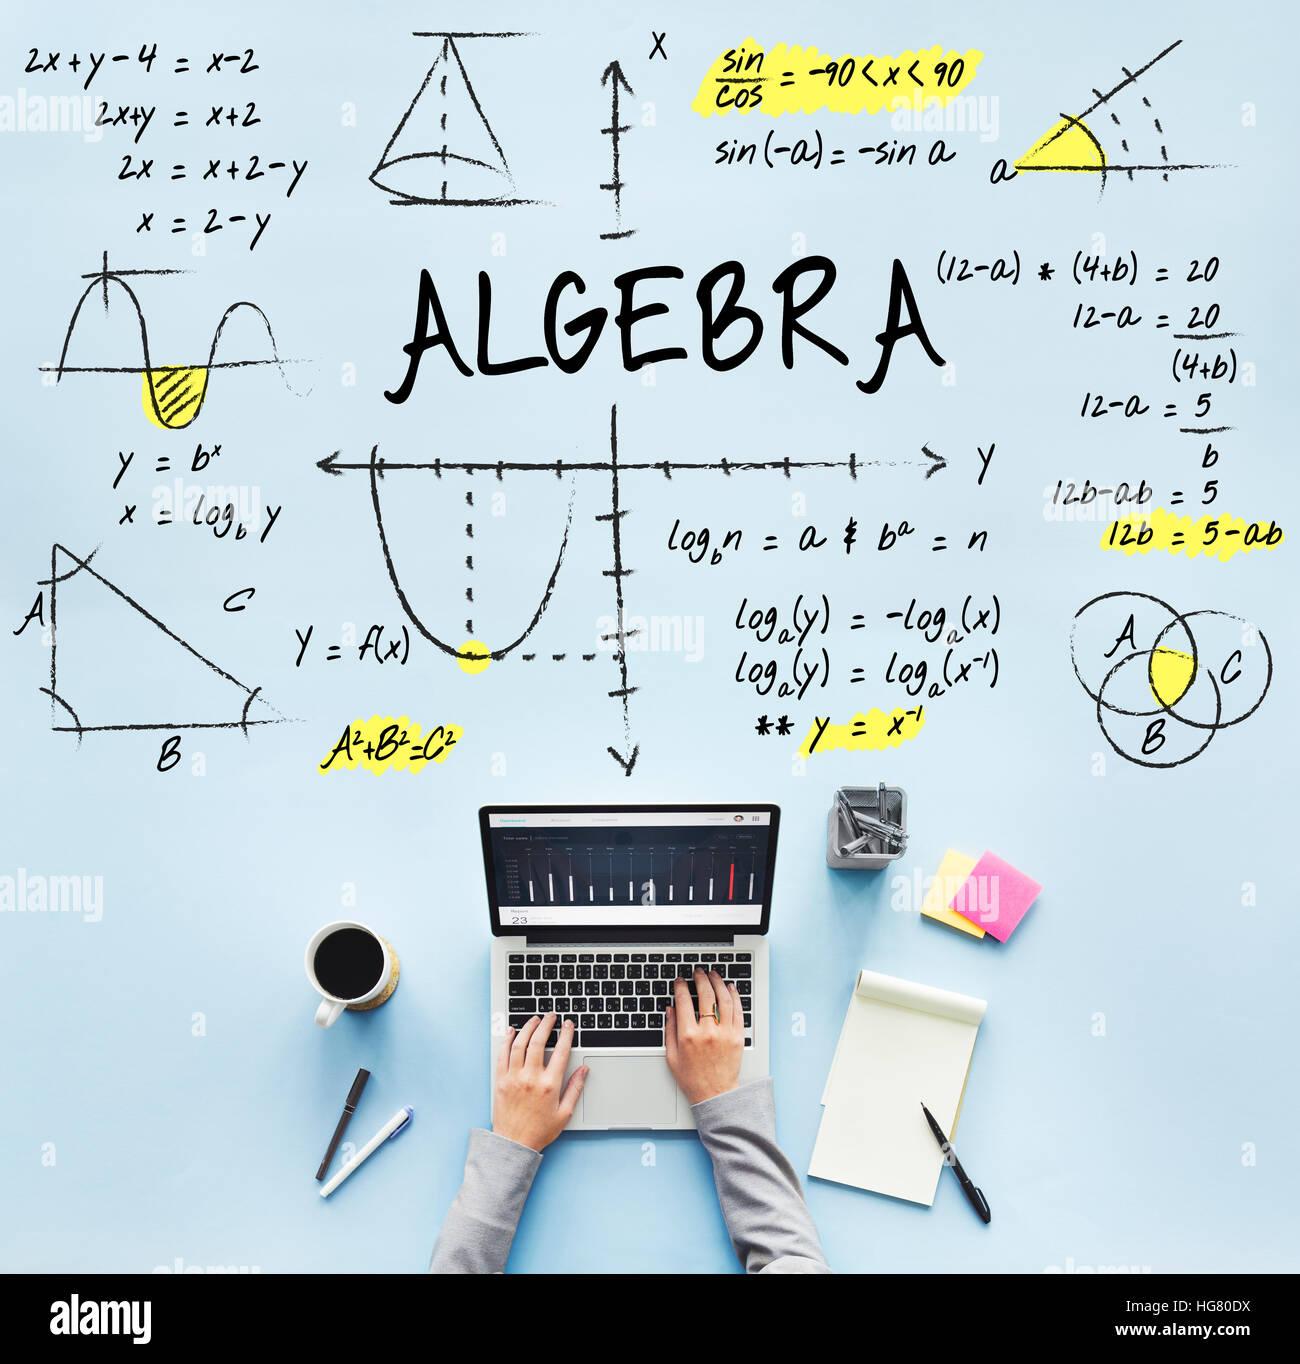 Math Equation Stock Photos & Math Equation Stock Images - Page 18 ...